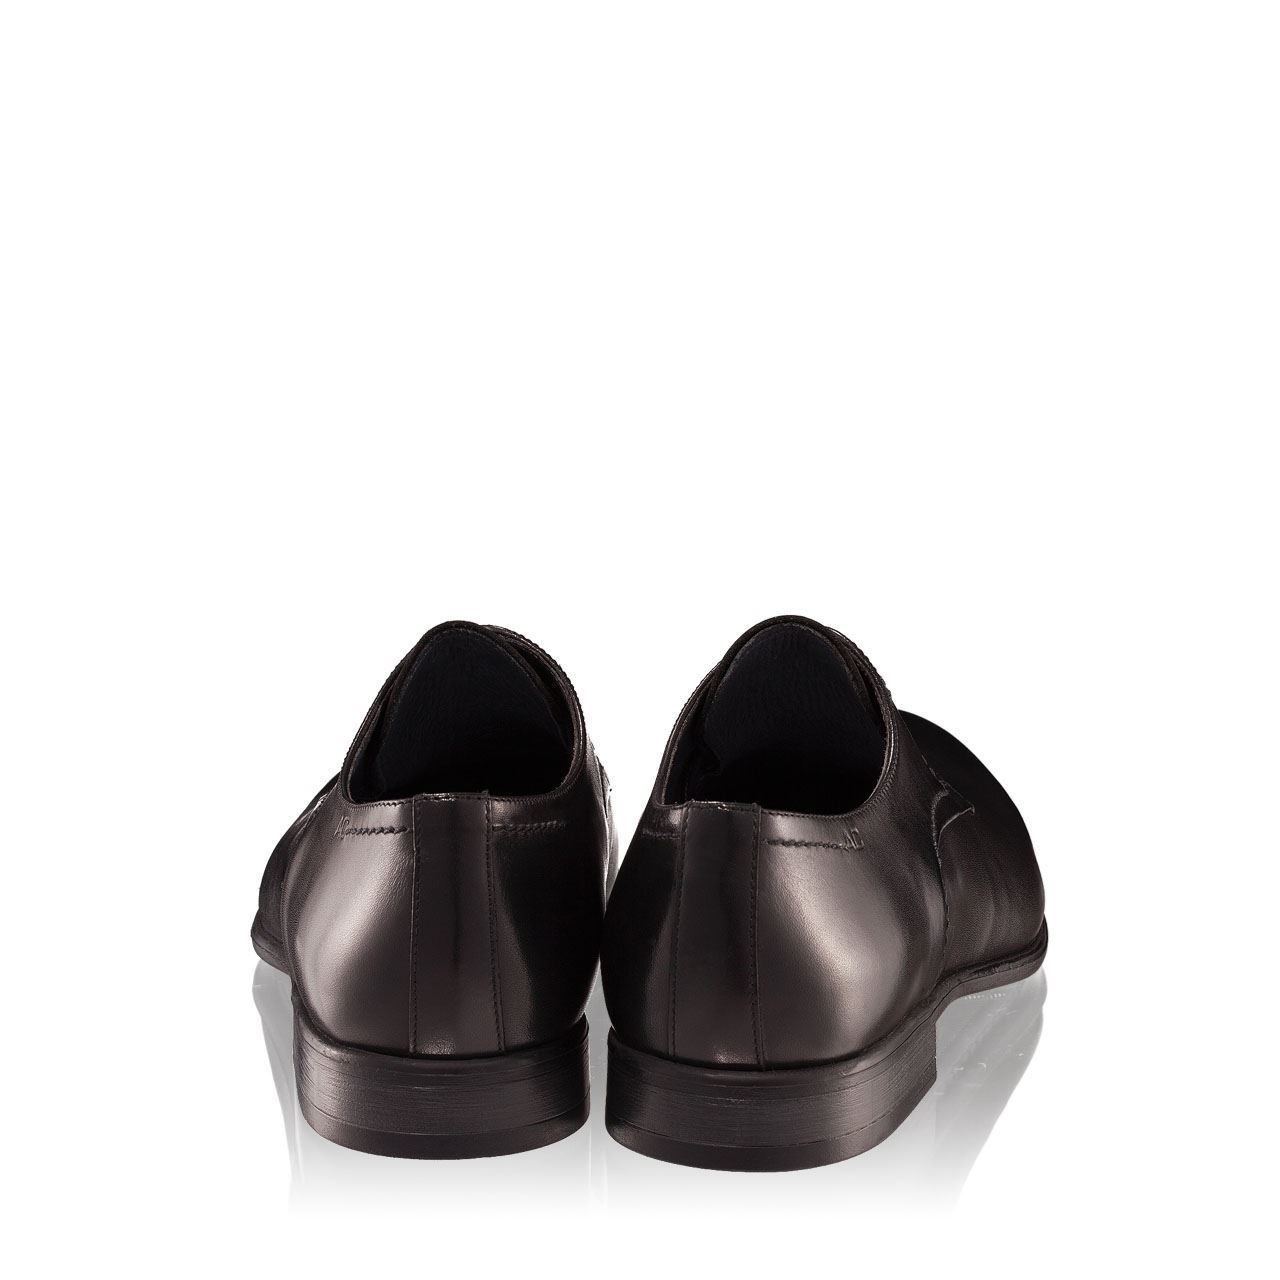 Pantofi barbati negri 2882 piele naturala